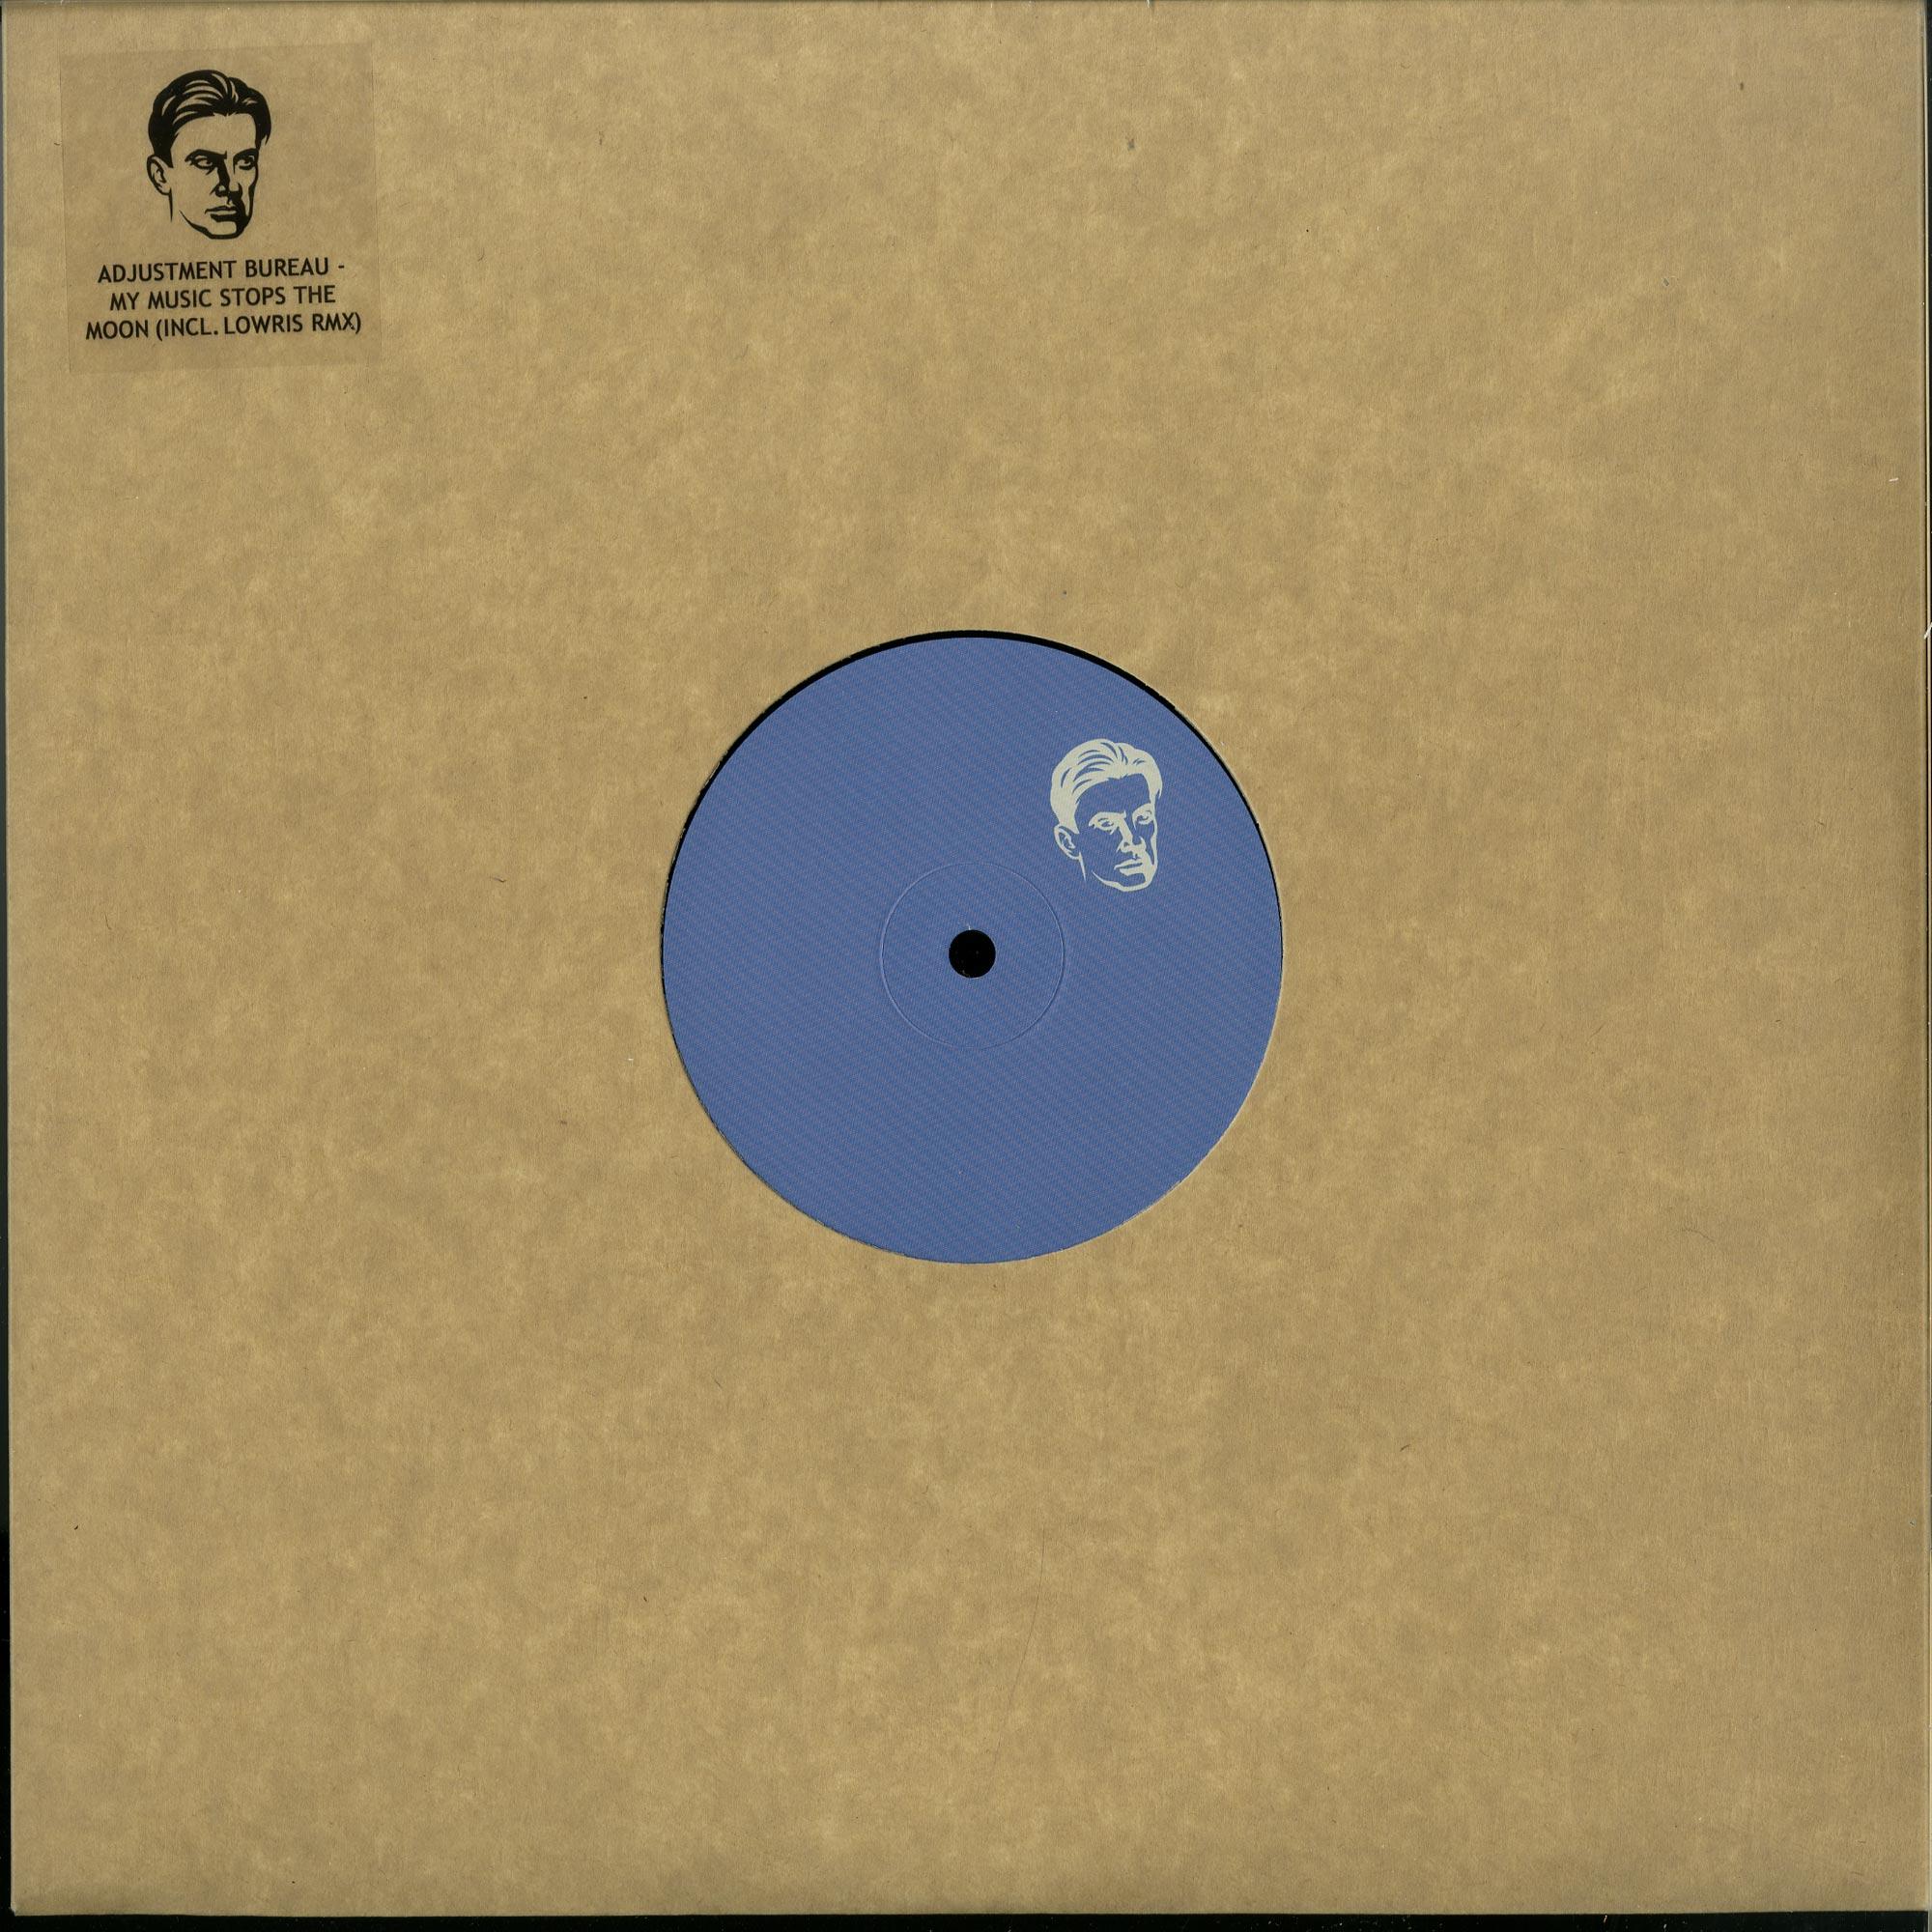 Adjustment Bureau - MY MUSIC STOPS THE MOON